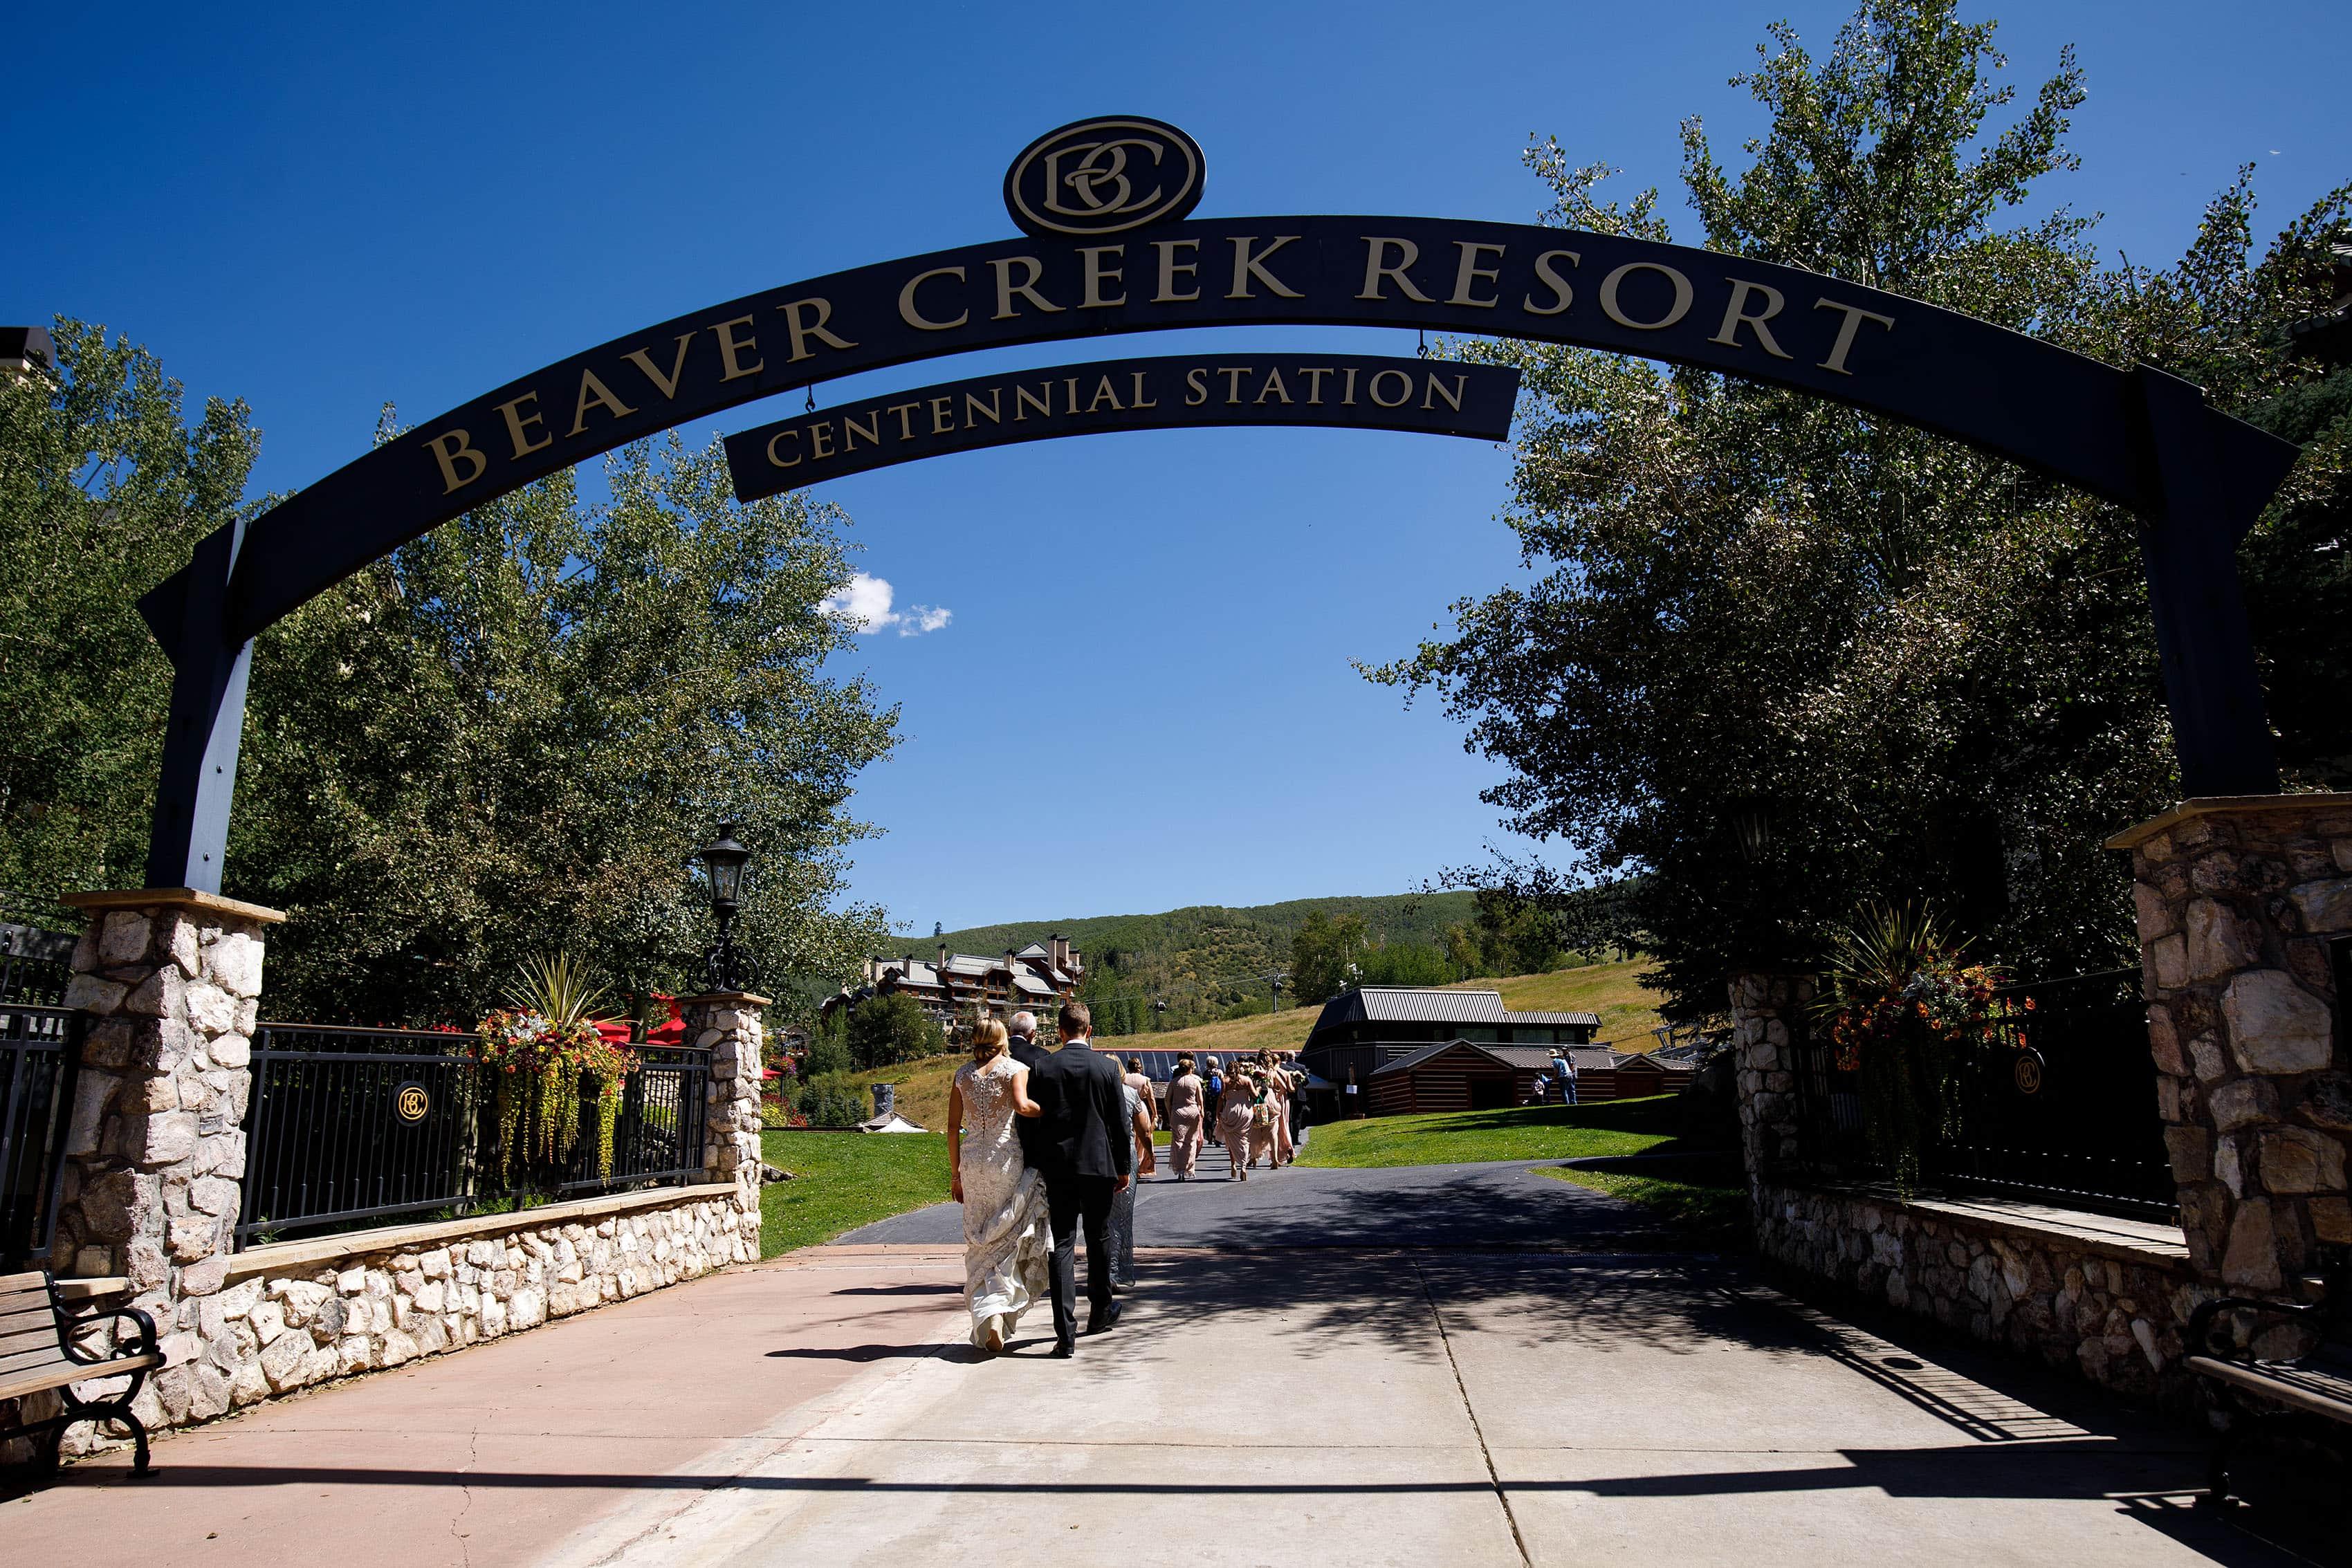 Bride and Groom walk near Centennial Station at Beaver Creek Resort